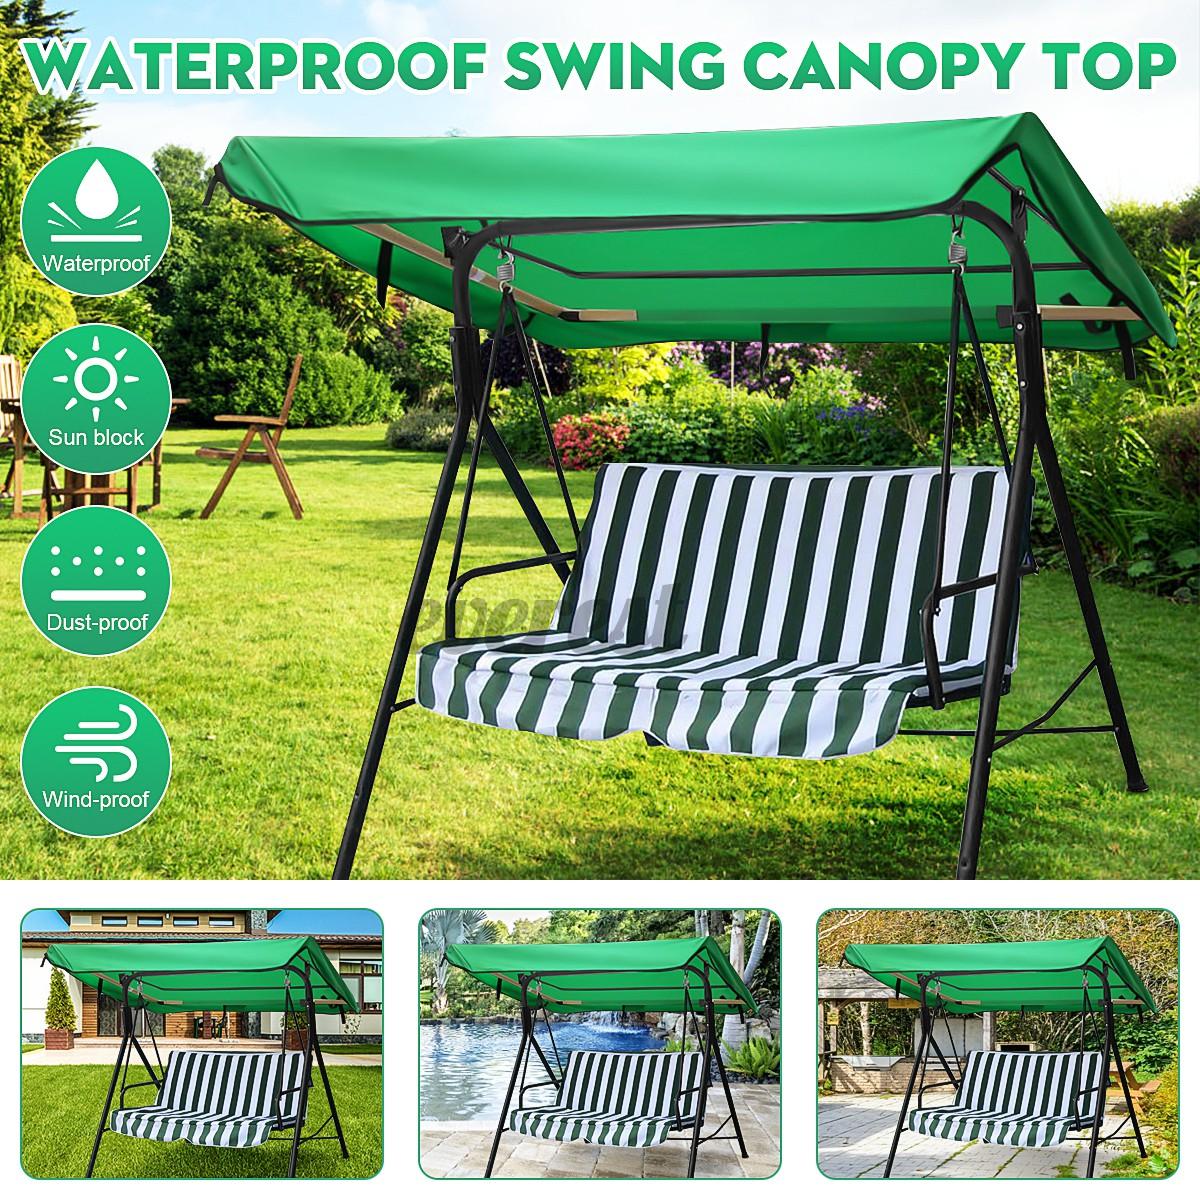 Heavy Duty Counter Stools, 2 3 Seater Hammock Swing Canopy Garden Chair Top Cover Patio Sunshade Waterproof Shopee Malaysia